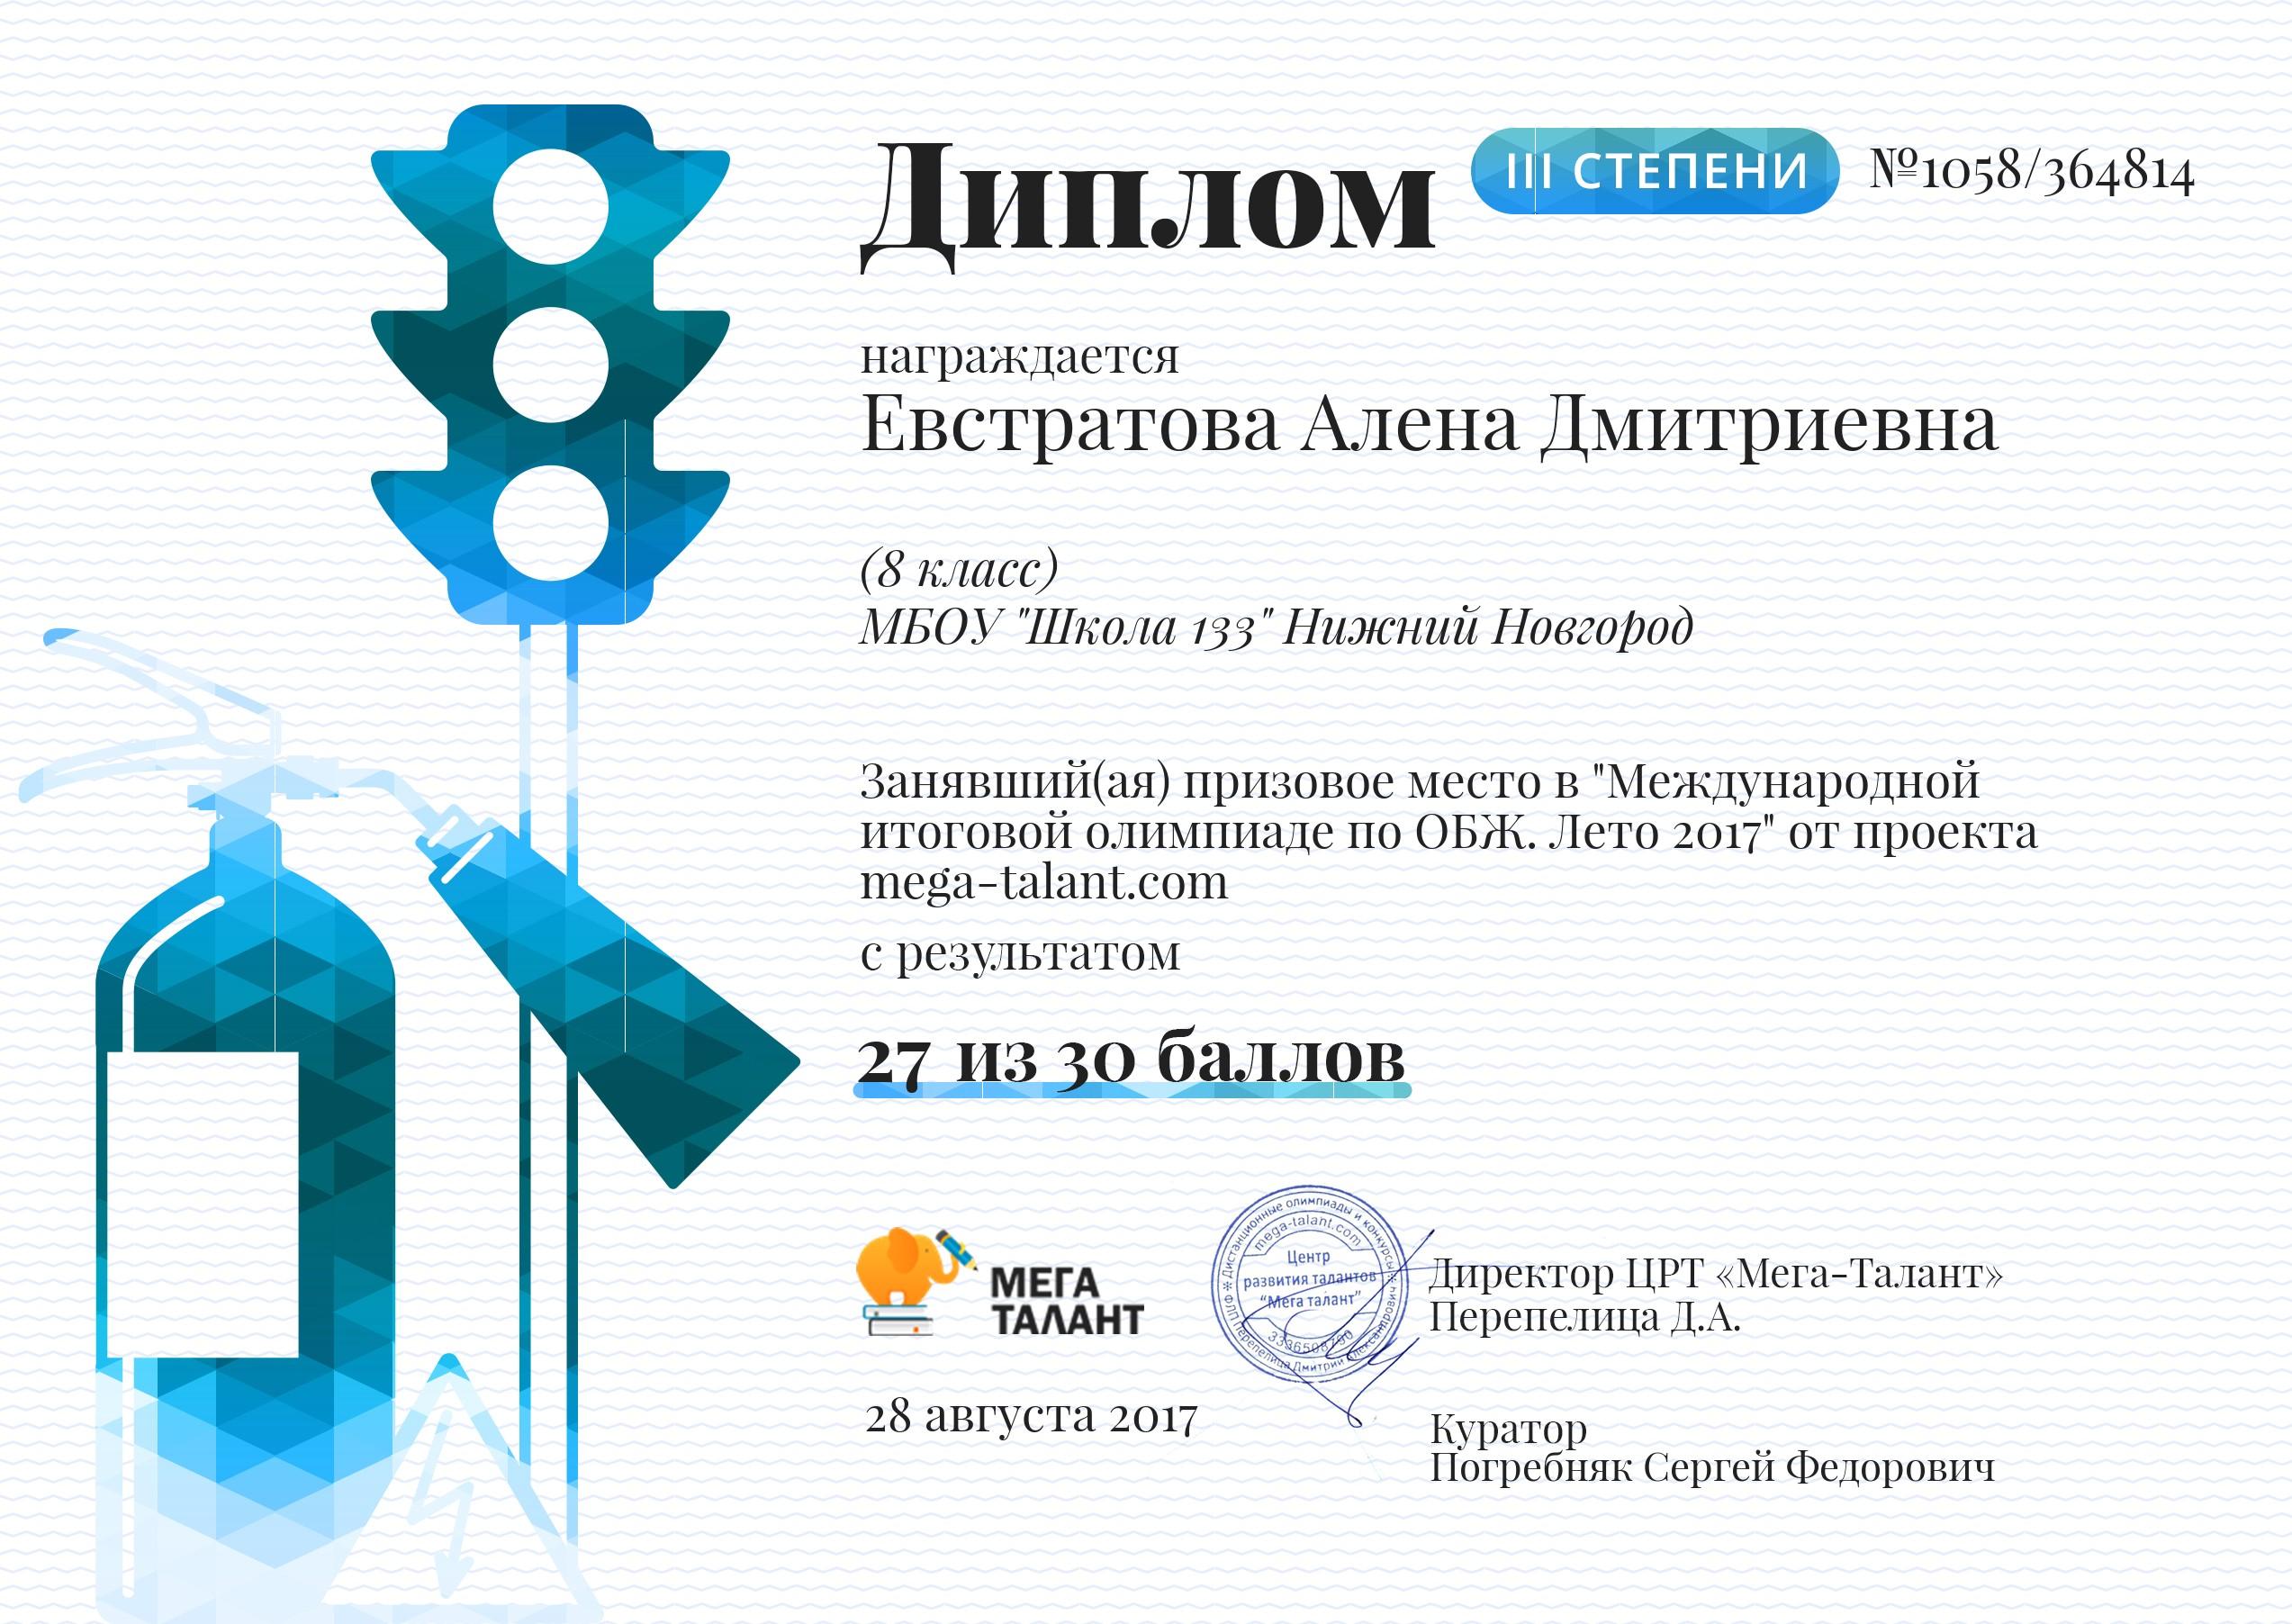 364814_evstratova-alena-dmitrievna.jpg